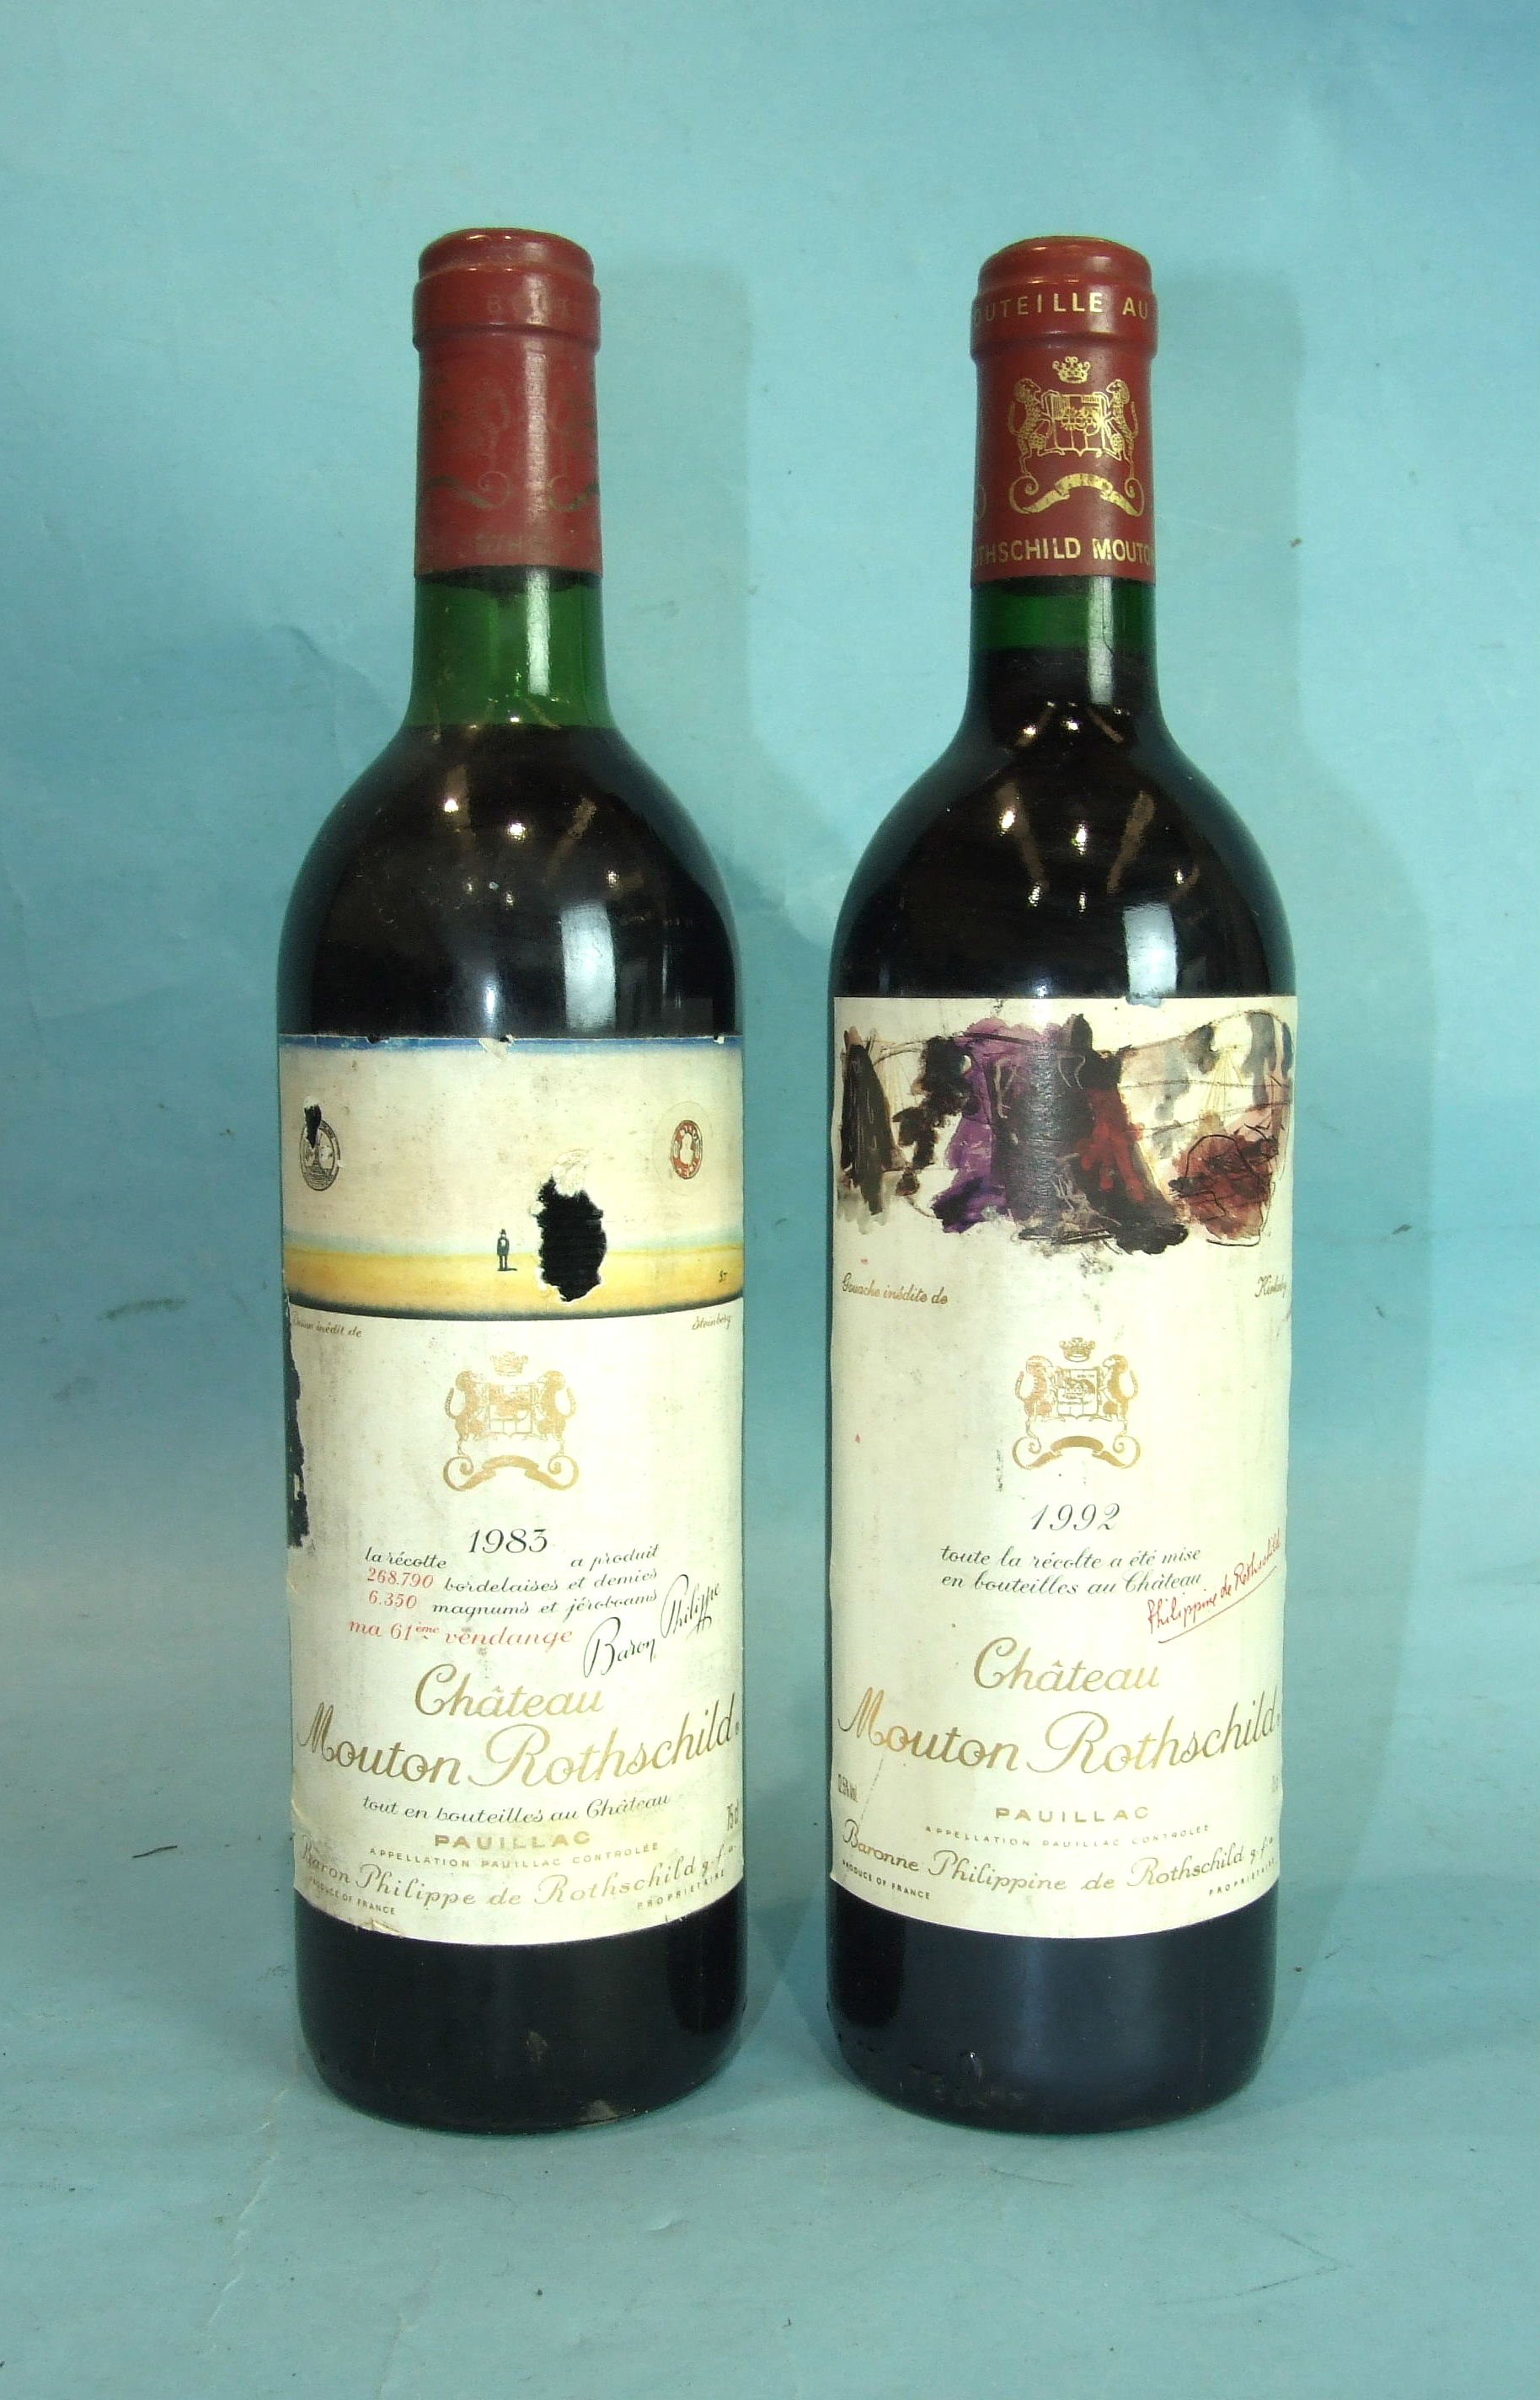 Lot 18 - Chateau Mouton Rothschild 1983 Premier Grand Cru Classé Bordeaux, one bottle and another of 1992